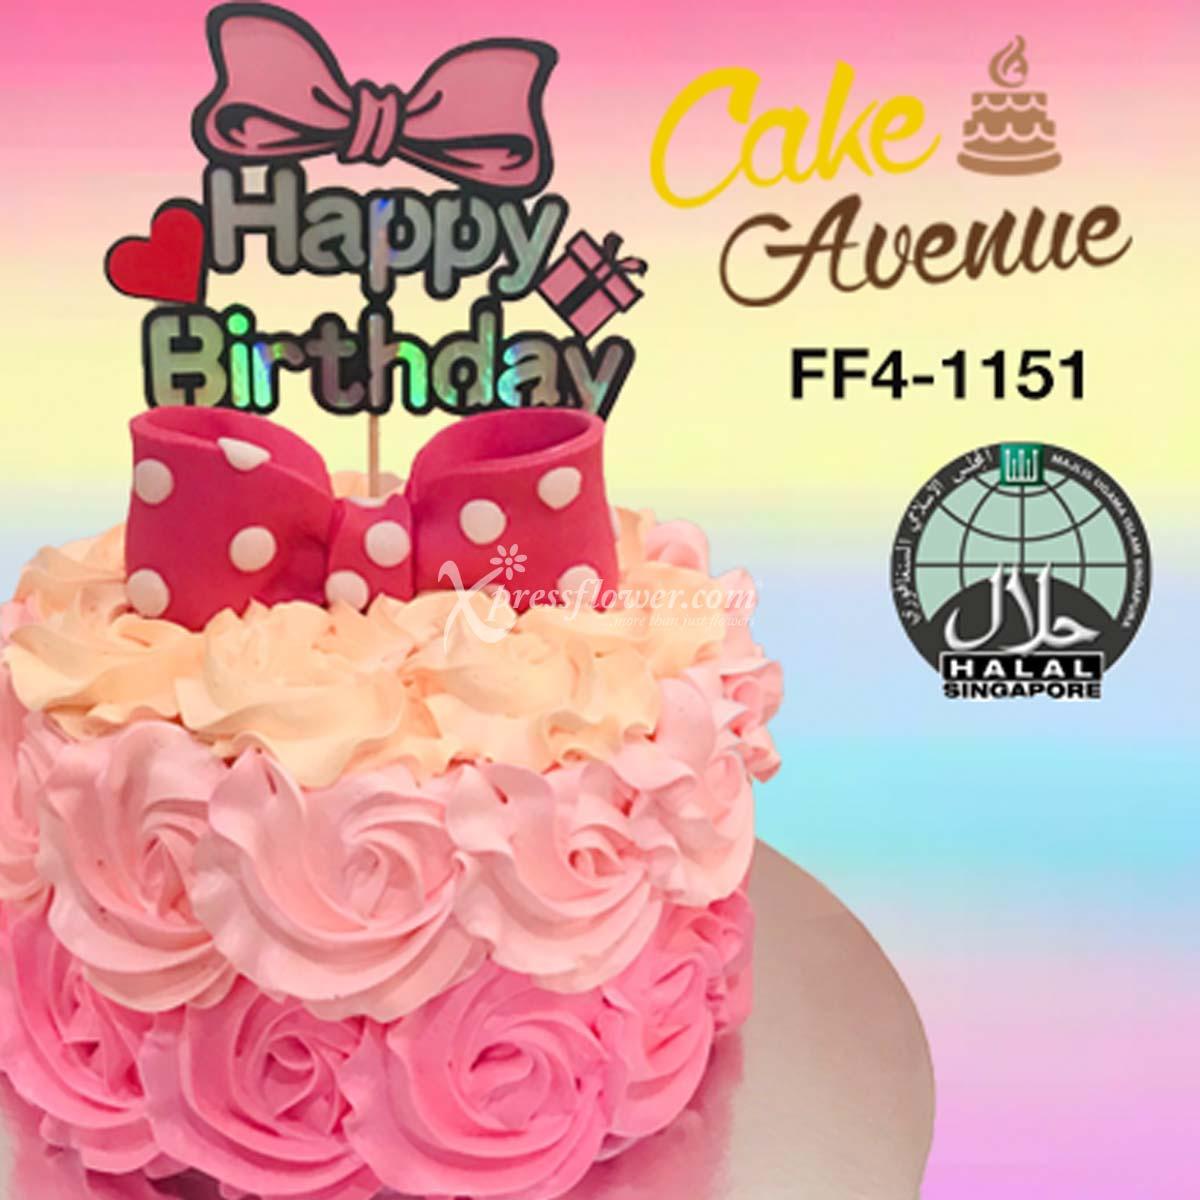 Rosette with Ribbon - Fresh Cream (Cake Avenue)